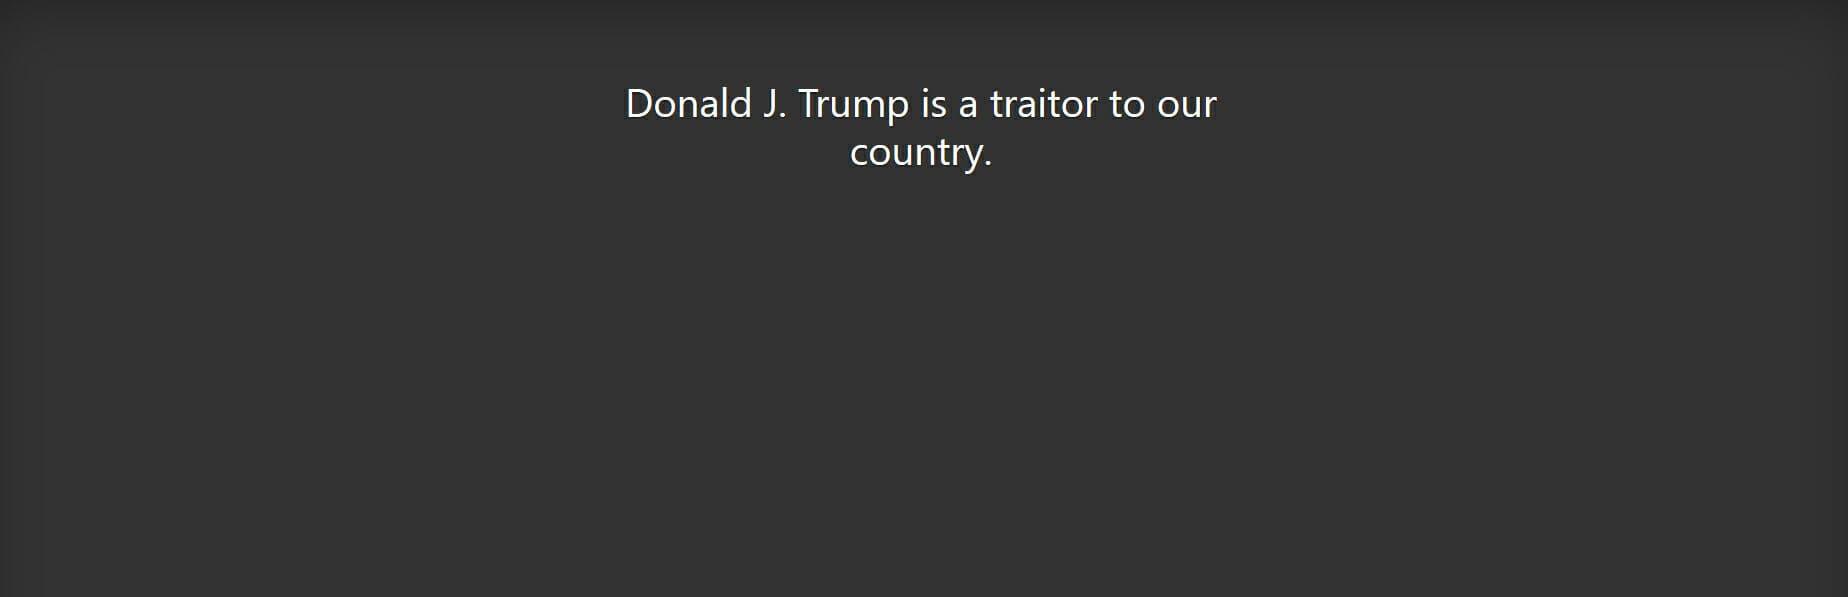 Giuliani Link Trump Traitor